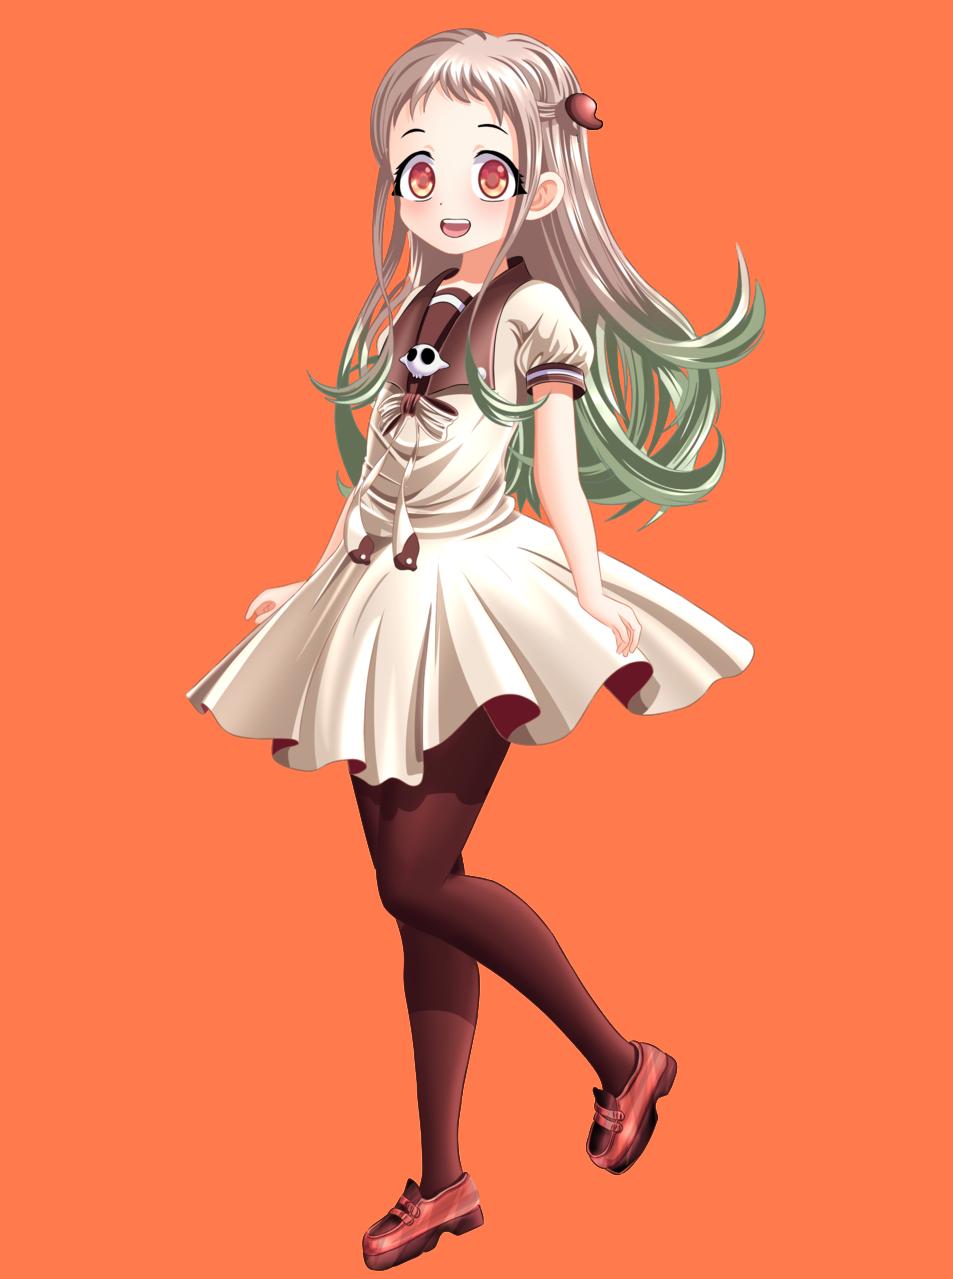 Yashiro Nene ✍🏻 Illust of Brayan Aguilar 7 medibangpaint cutegirl anime Hanakokun かわいらしい NeneYashiro アニメの女の子 Toilet-boundHanako-kun